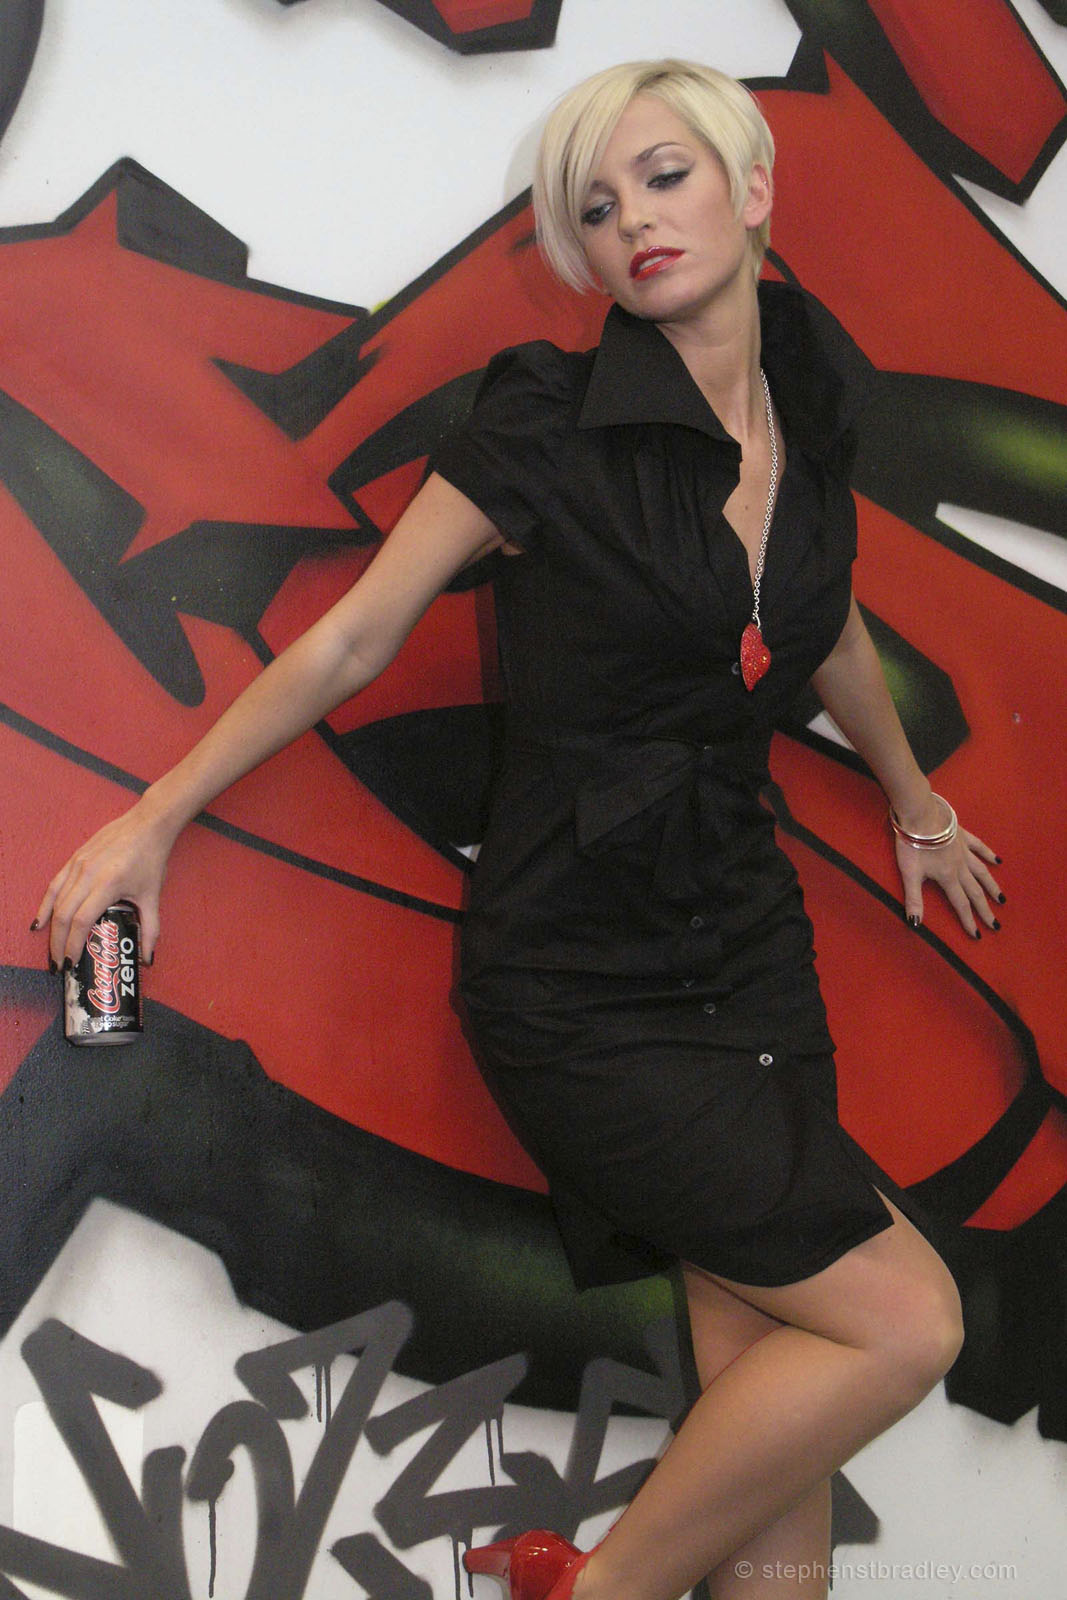 PR Photographer Dublin Ireland photo 1014101 - Sarah Harding Girls Aloud promoting Coca Cola Zero for Edelman PR